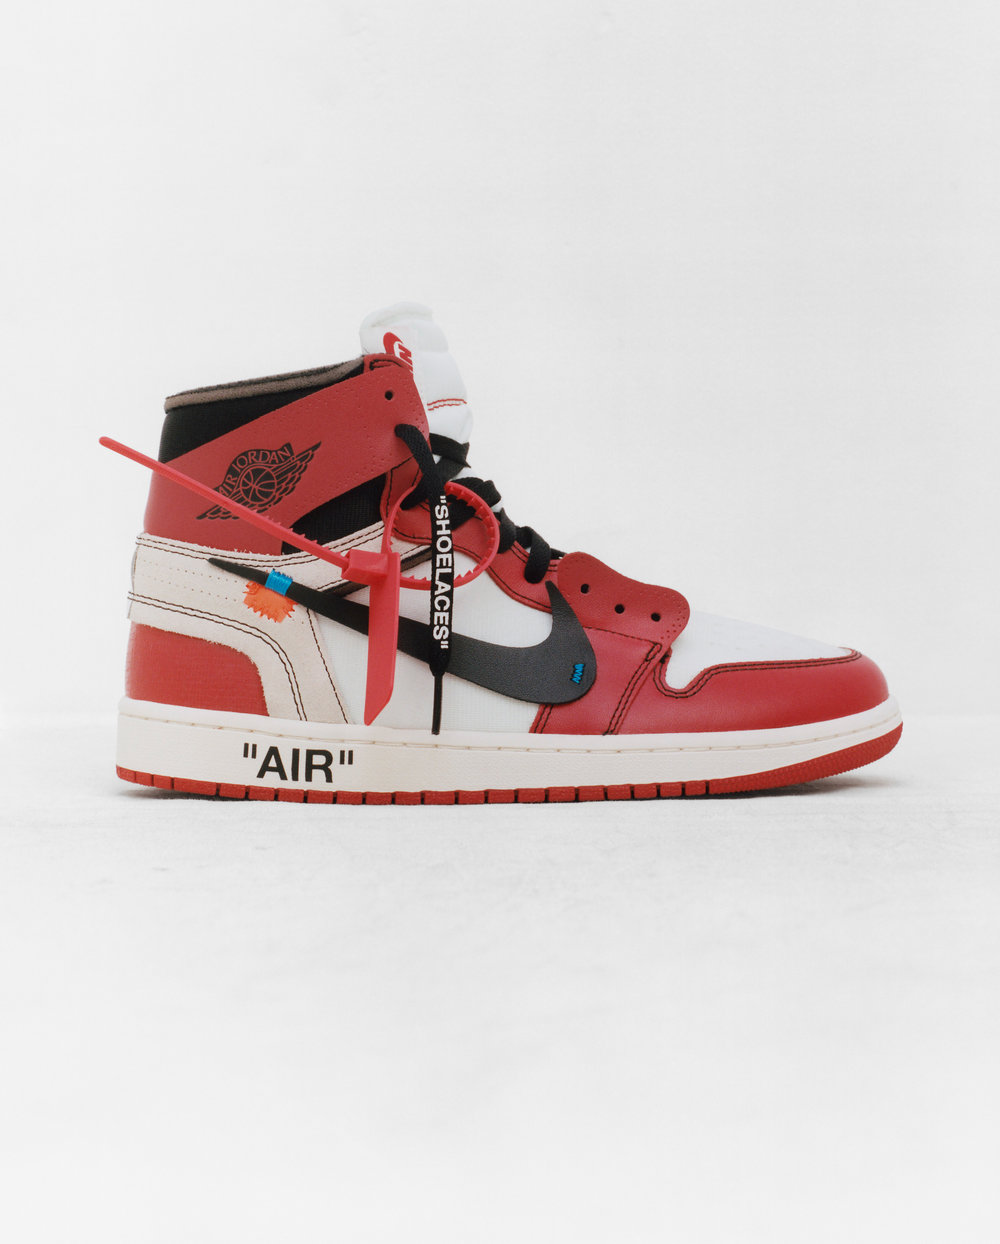 Virgil-Abloh-Nike-The10-8_73199.jpg